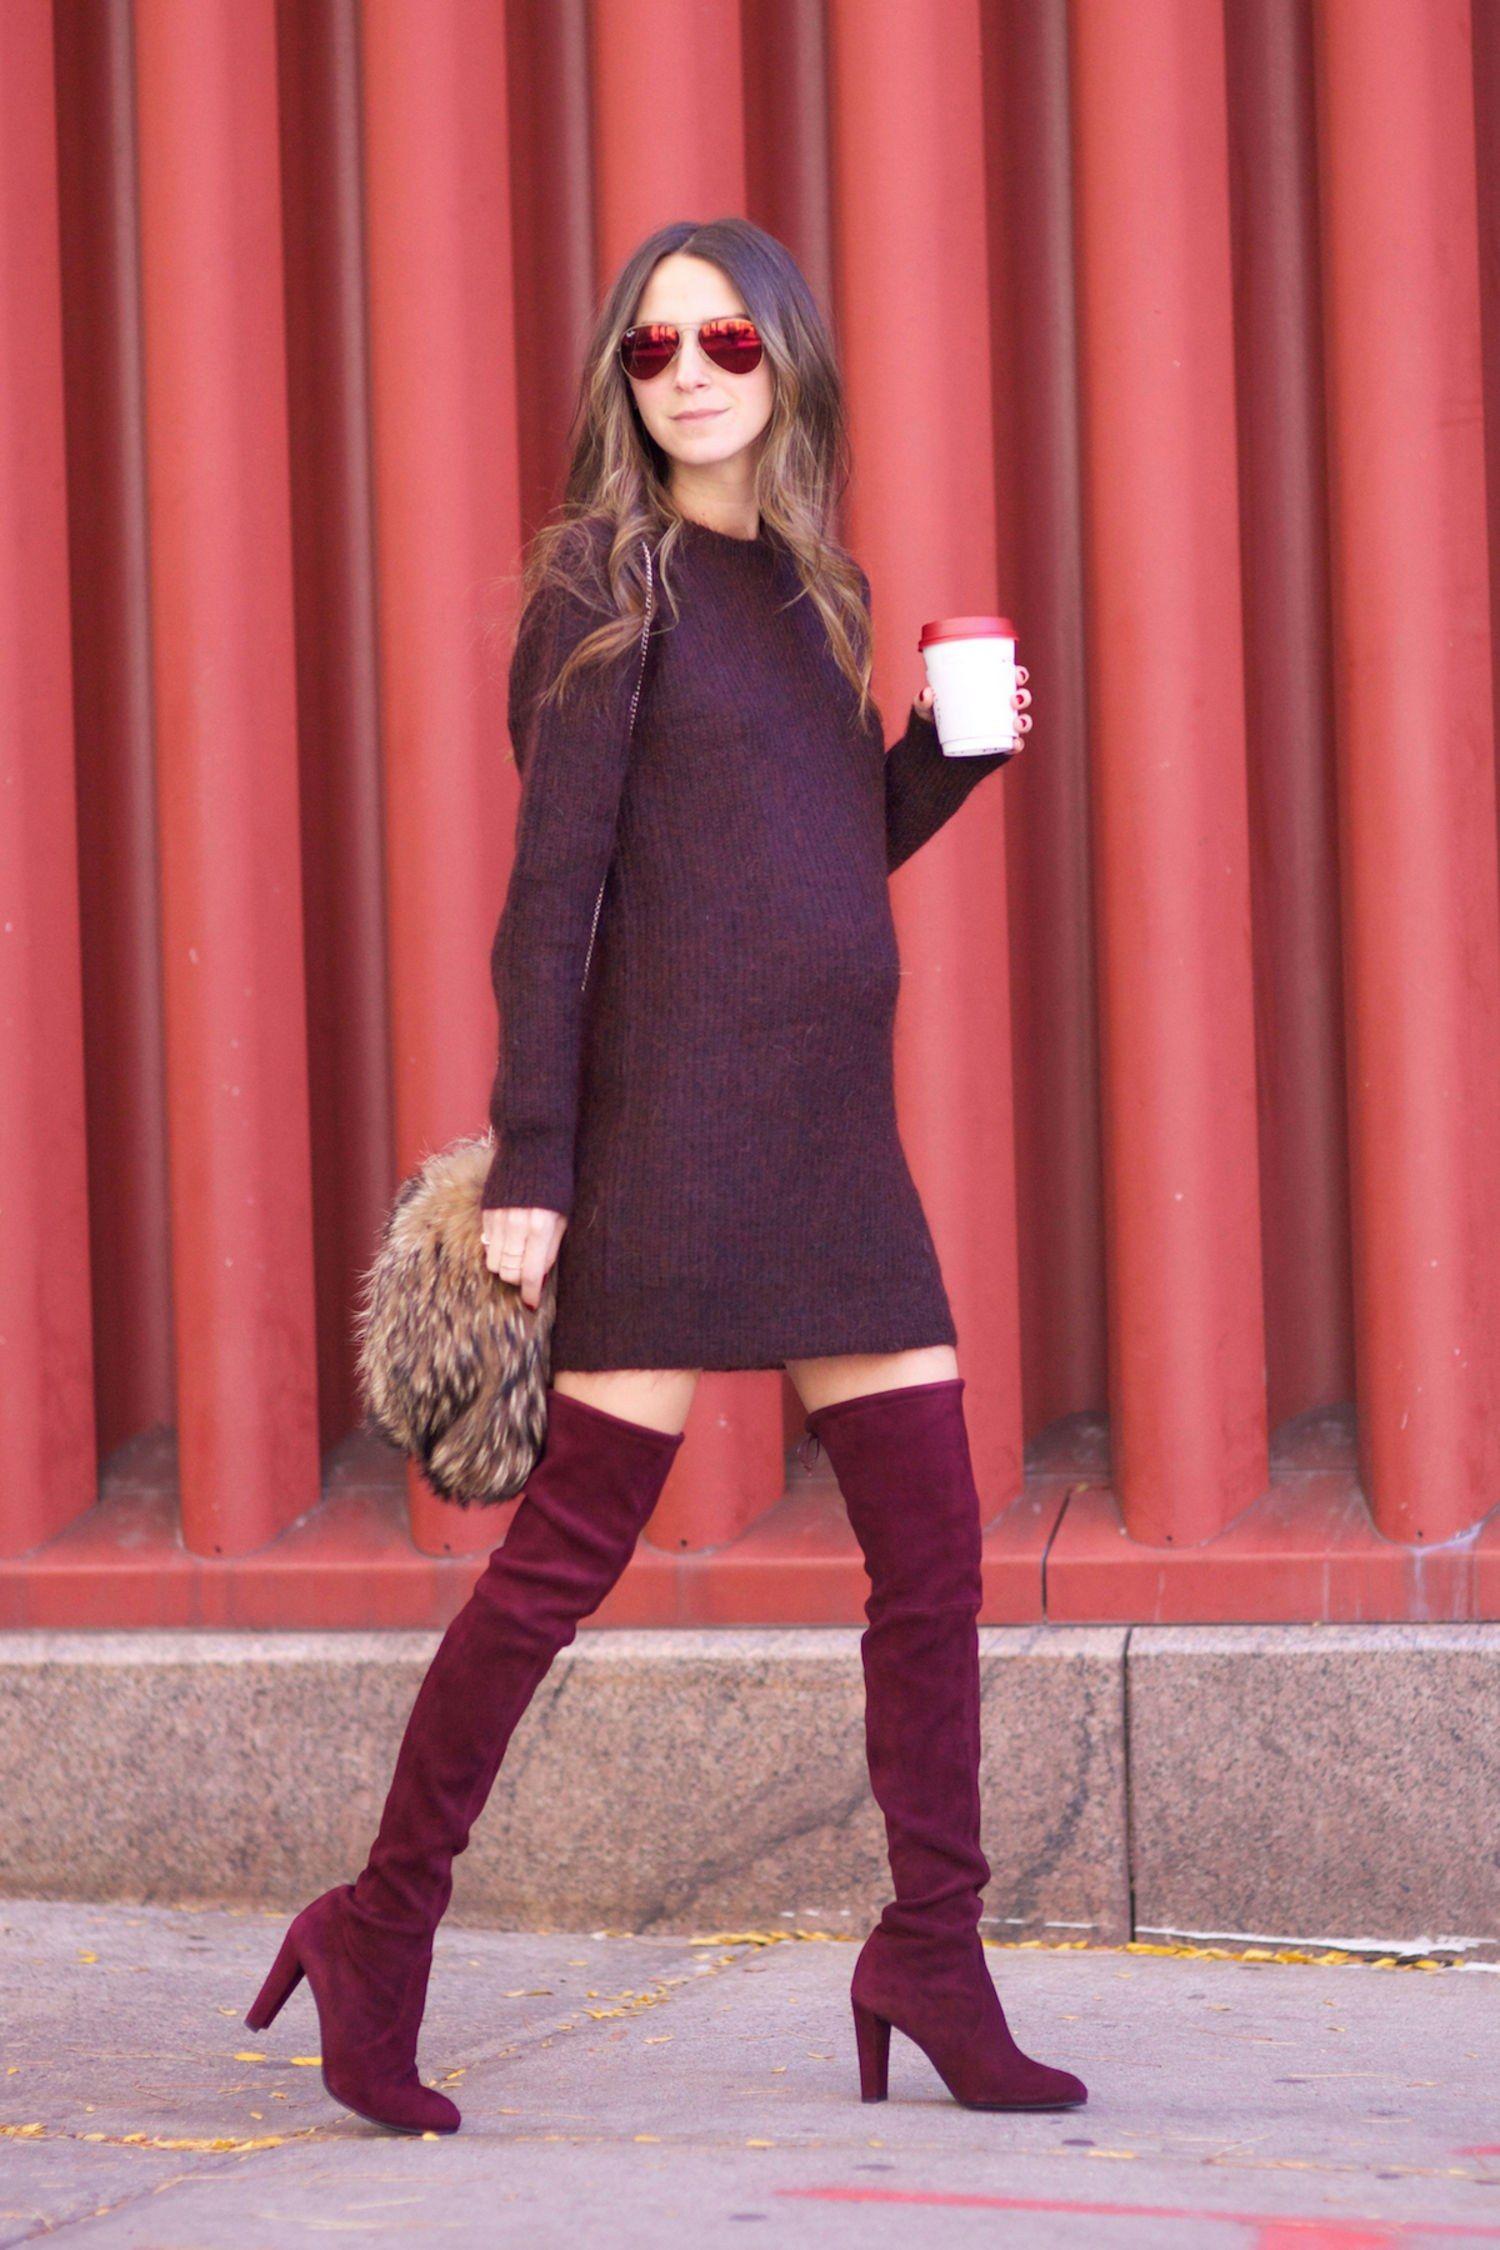 2 tones of crimson/burgundy, full boot.